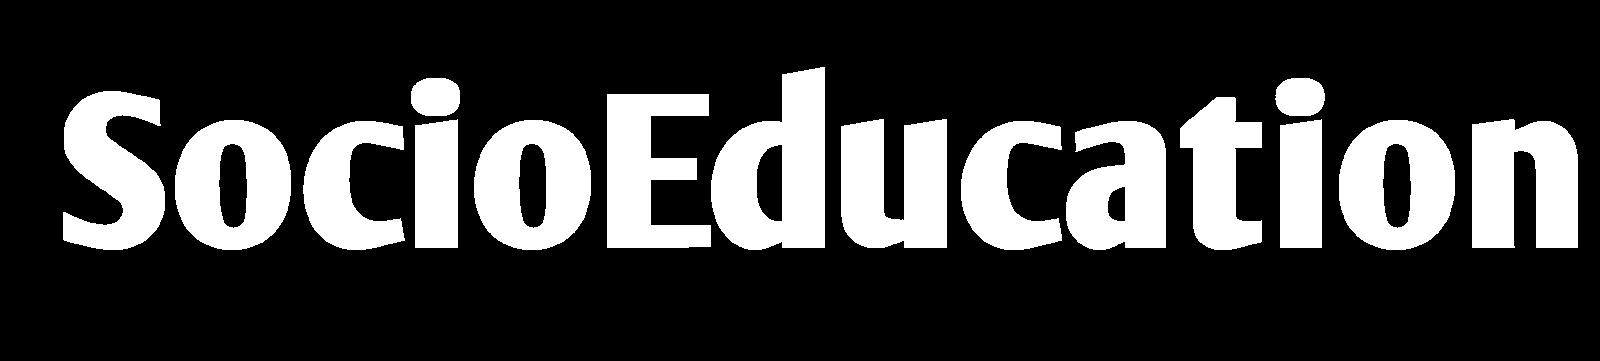 Socio Educations - સમાચારો ની દુનિયા